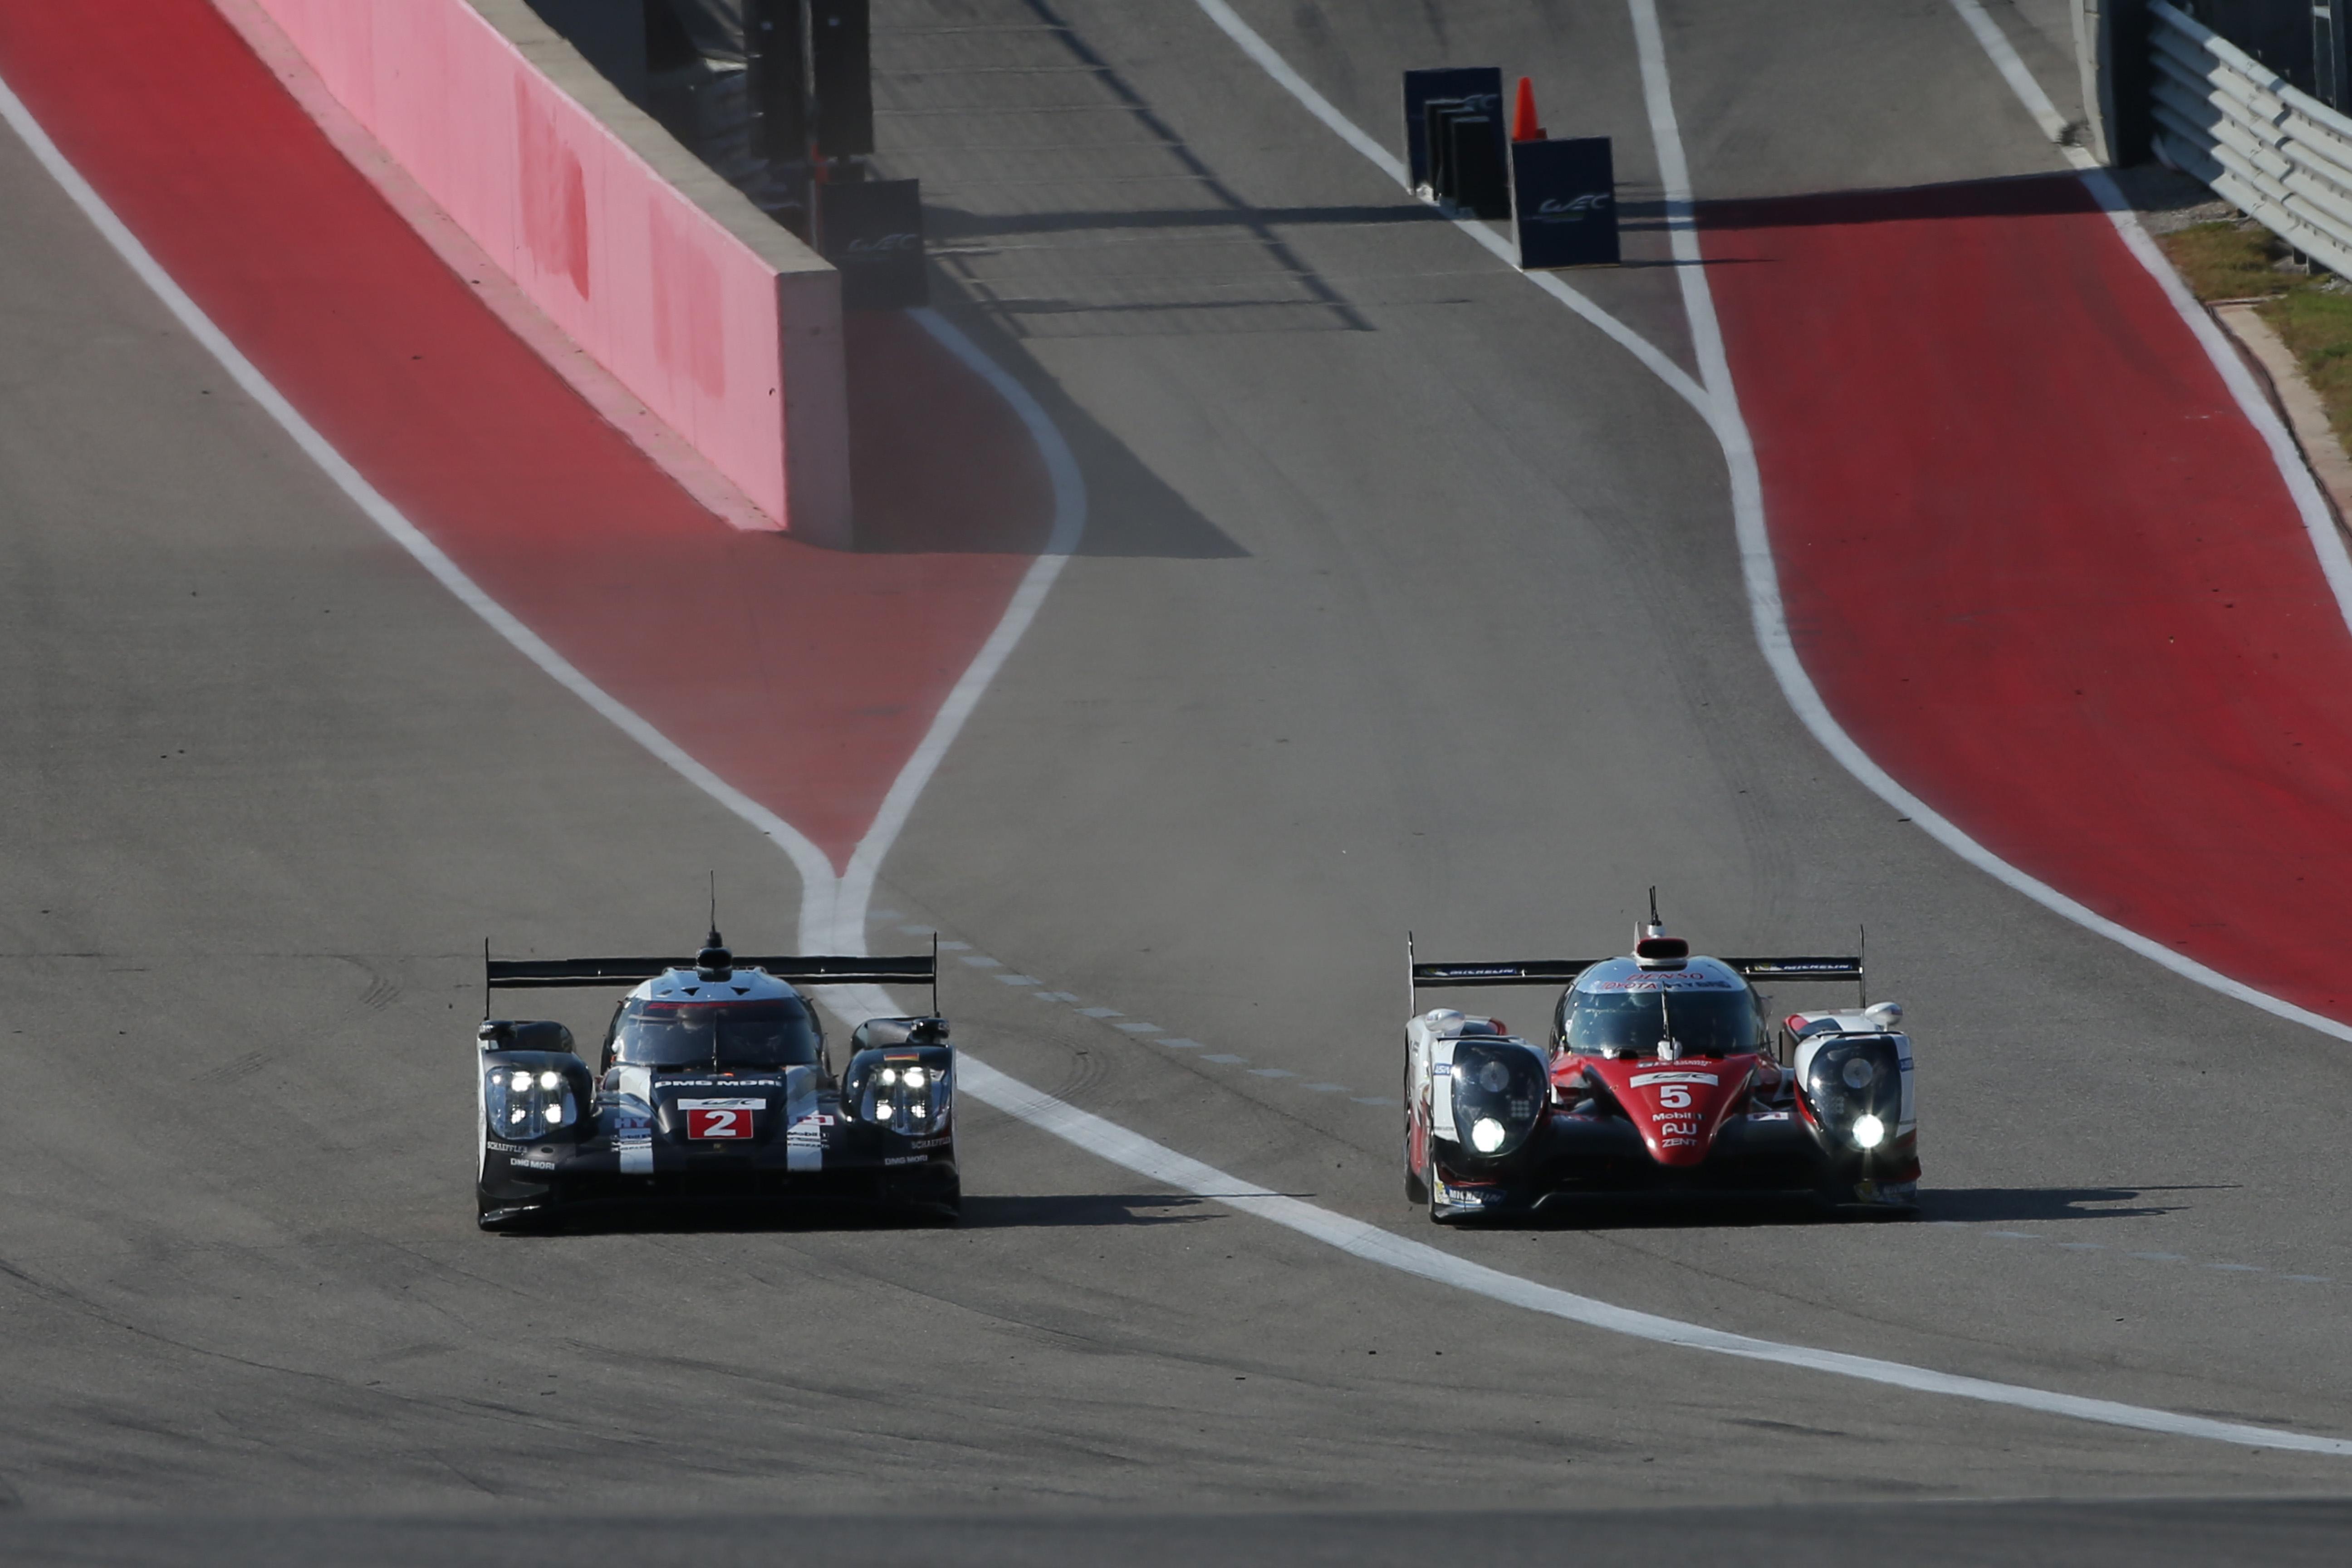 Motor Racing Fia World Endurance Championship Wec Round 6 Austin, Texas, Usa